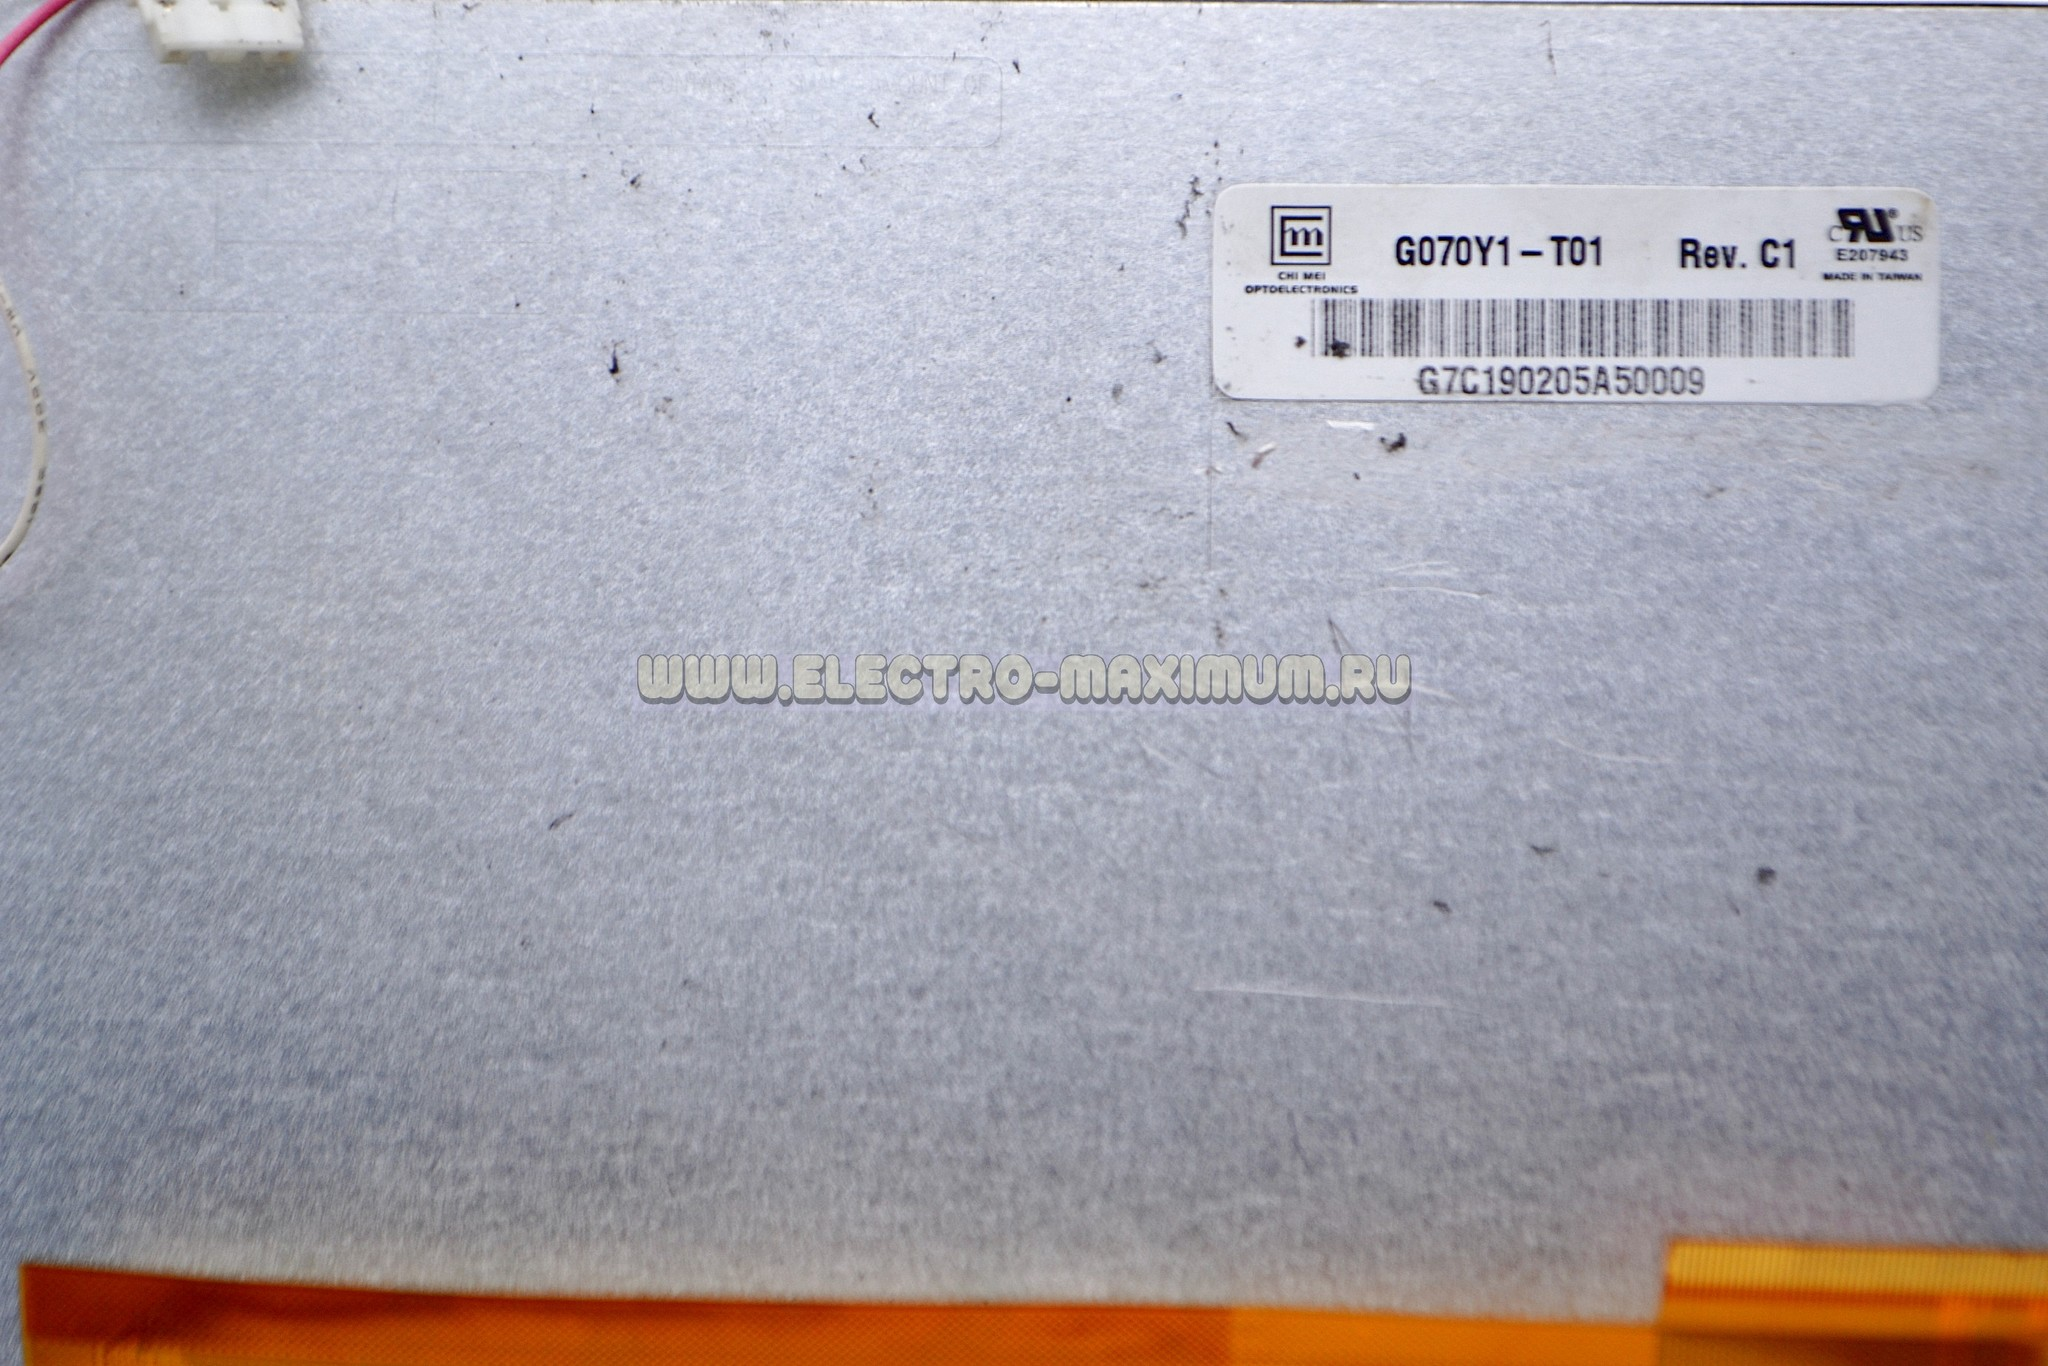 TFT LCD 7″ G070Y1-T01